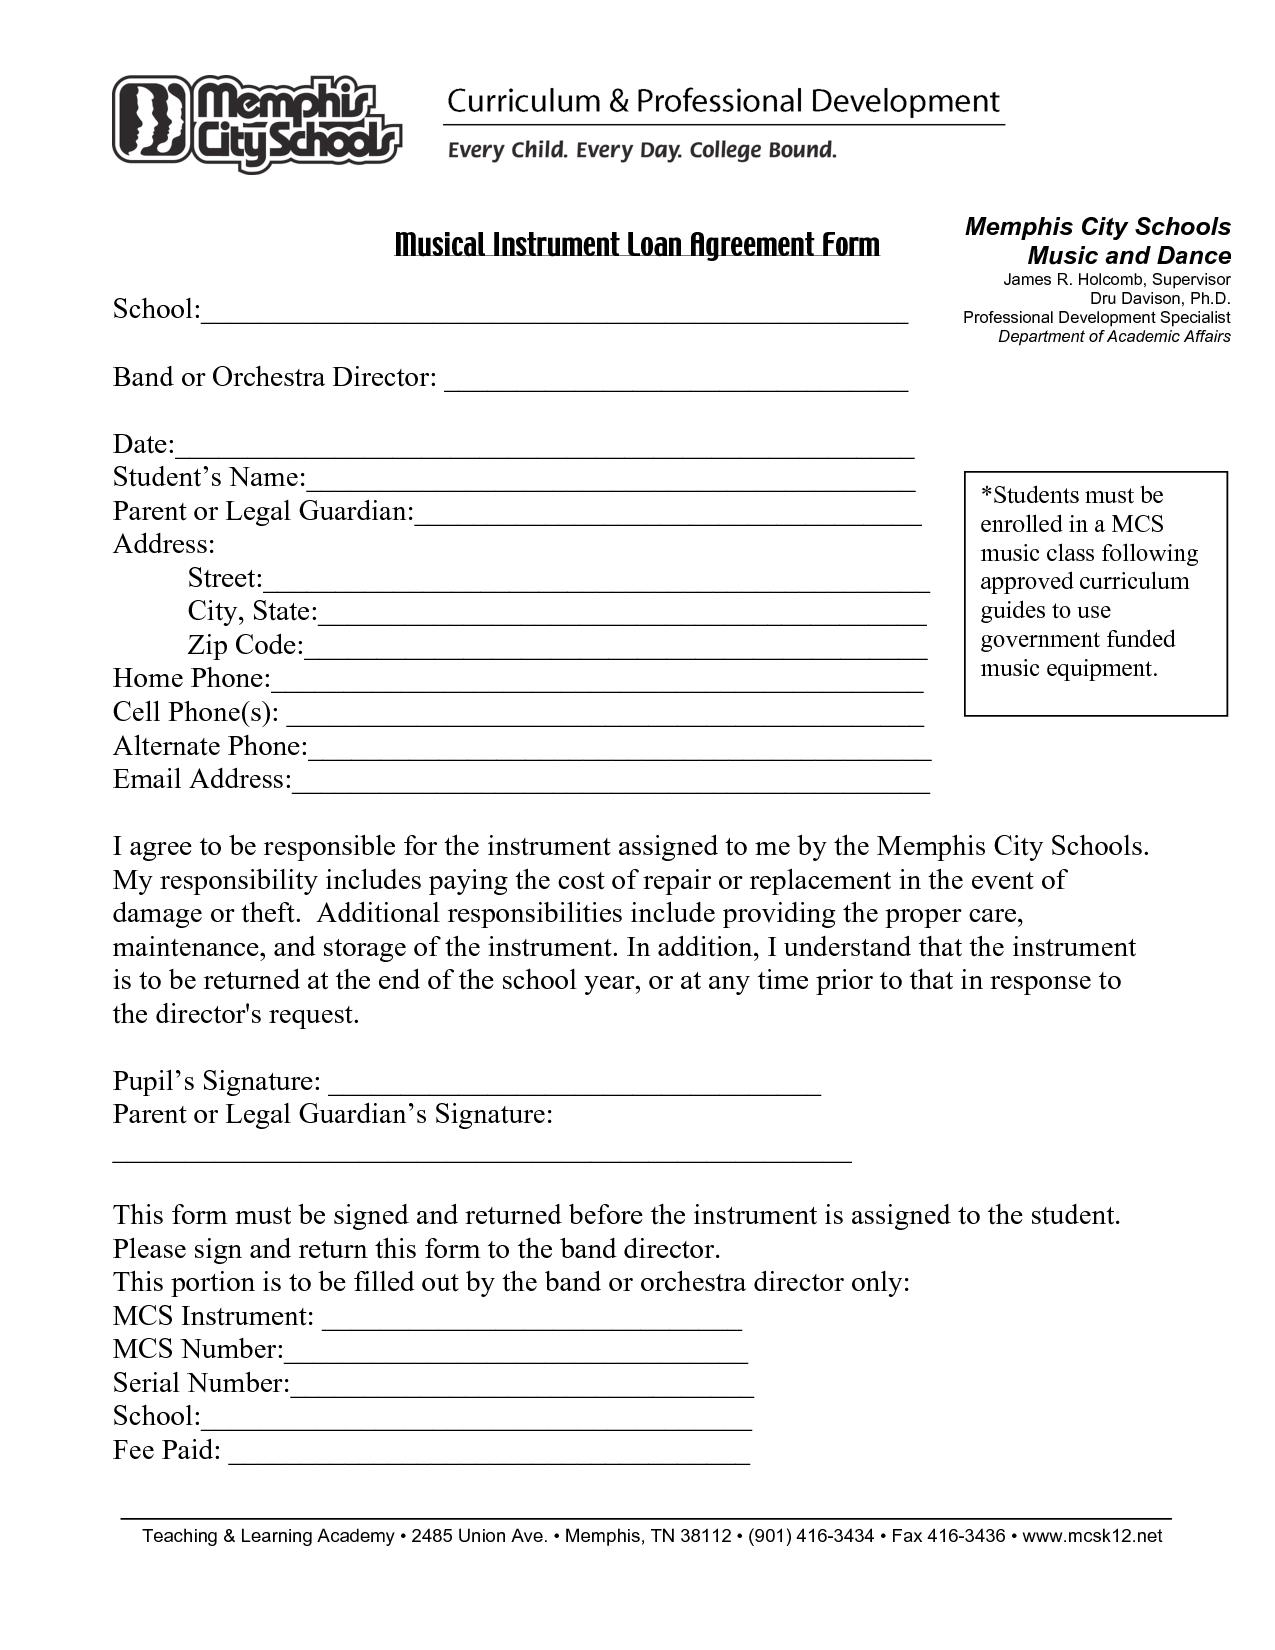 Printable Sample Loan Agreement Form Form | Attorney Legal Forms - Free Printable Loan Agreement Form